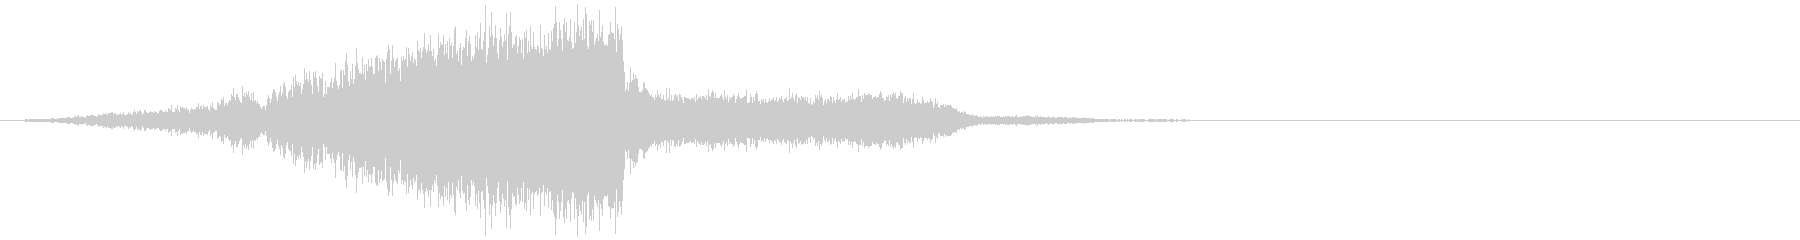 【RISER】場面切り替え時の効果音の未再生の波形